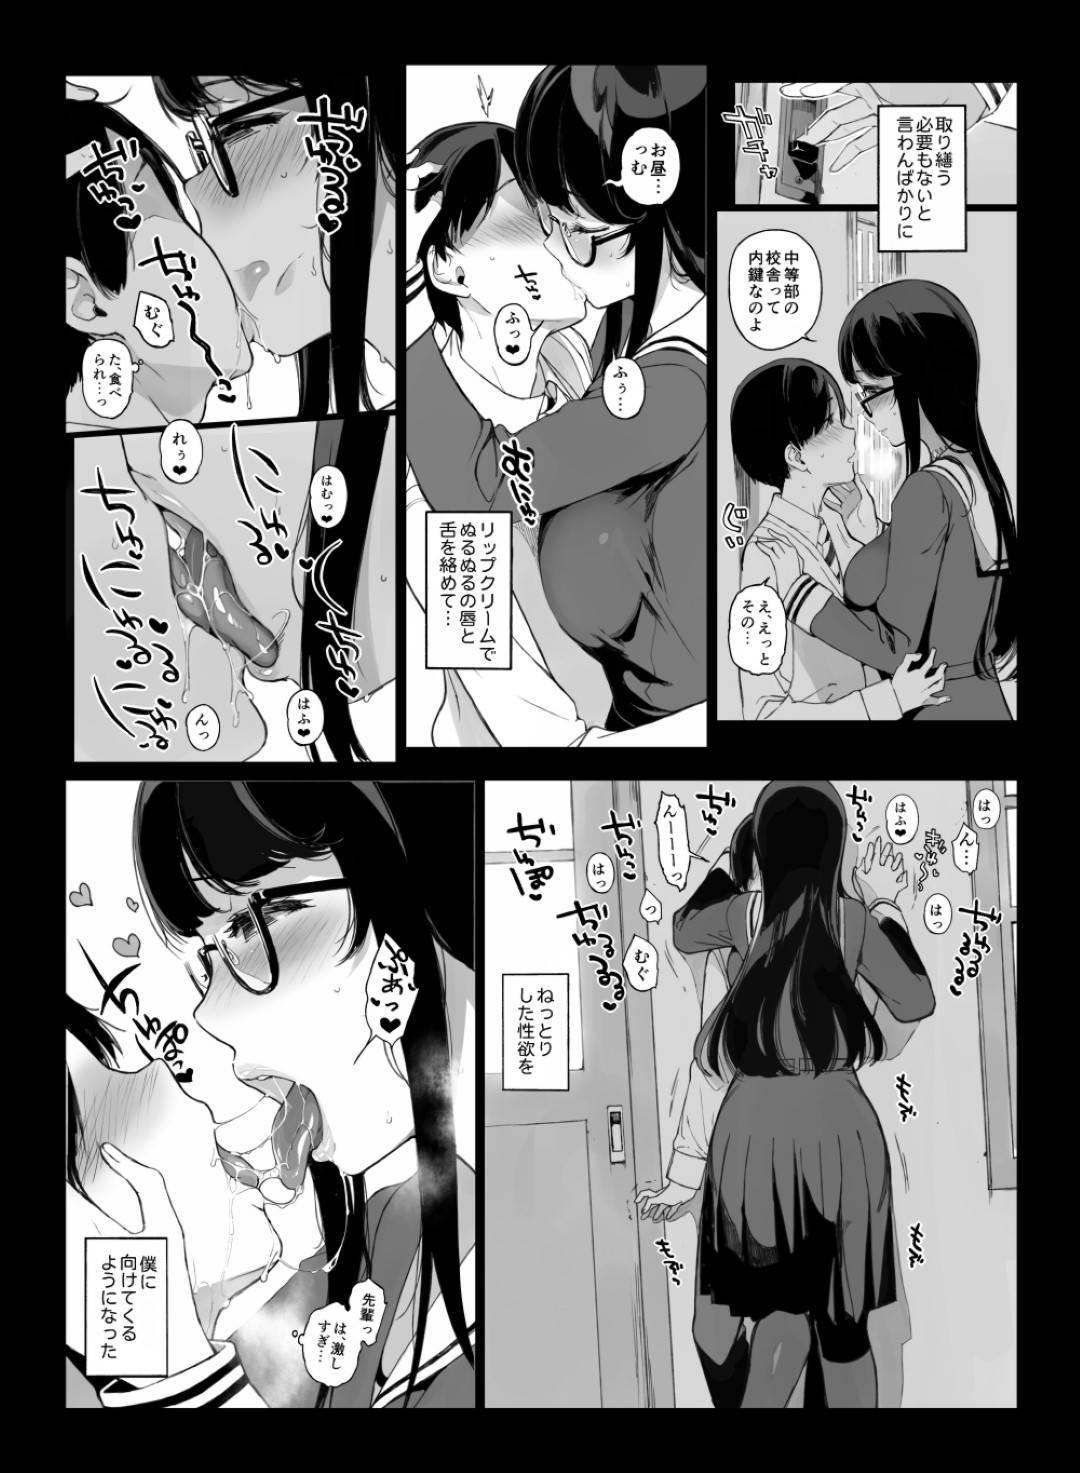 【JKおねしょたエロ漫画】中等部の巽は文芸部の部室で高等部の柚乃に寝込みを襲われる。その日以降、柚乃とエッチな事をしまくり、中出しセックスを楽しむ【笹森トモエ】